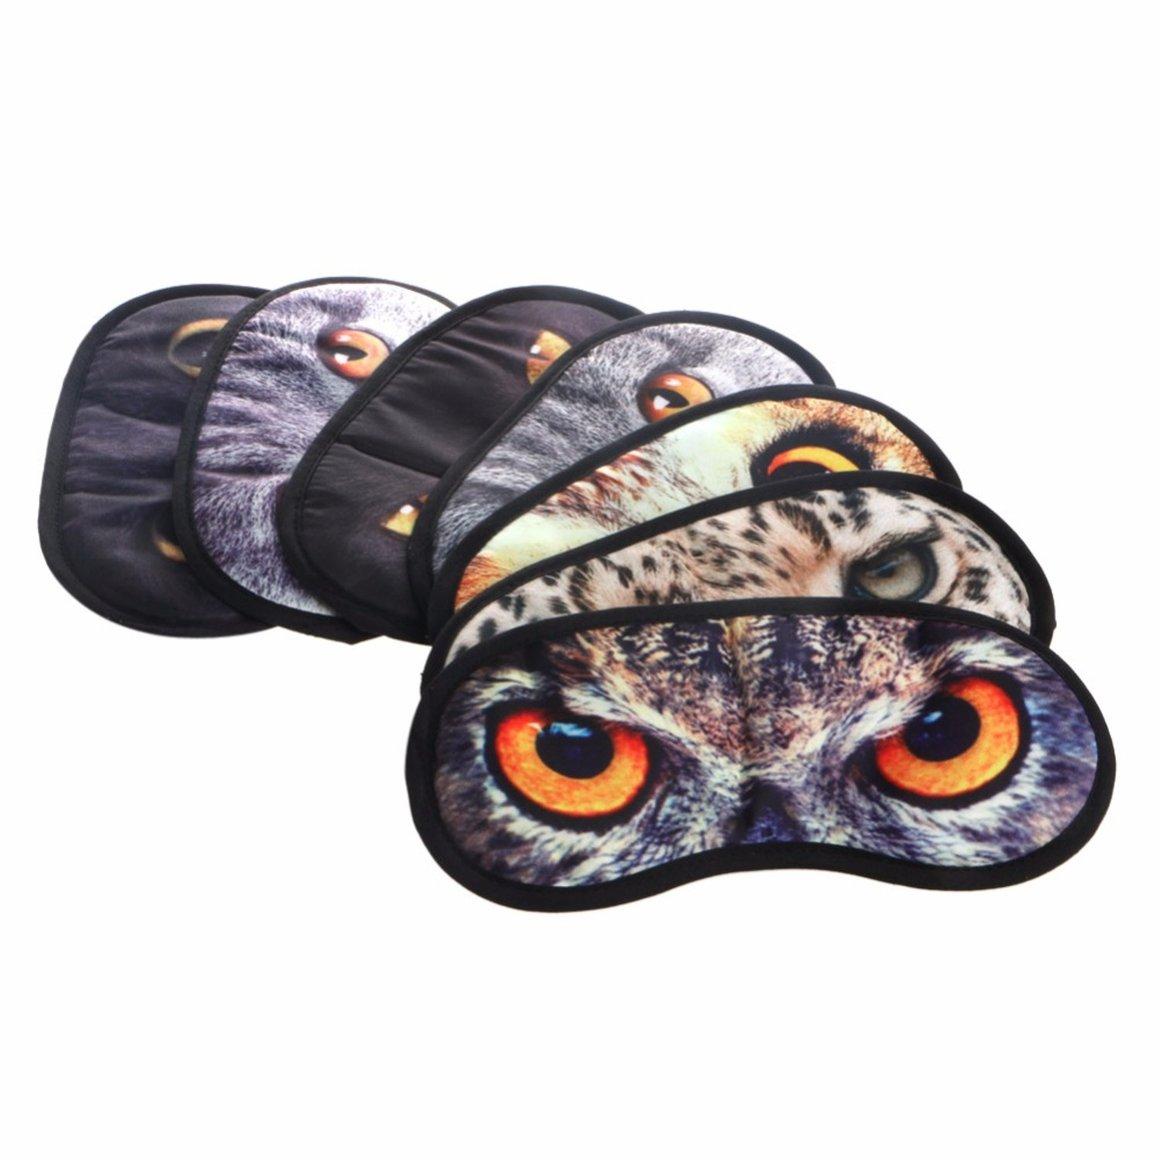 $0.00 Animal print sleeping mask WARNING: possible phishing site